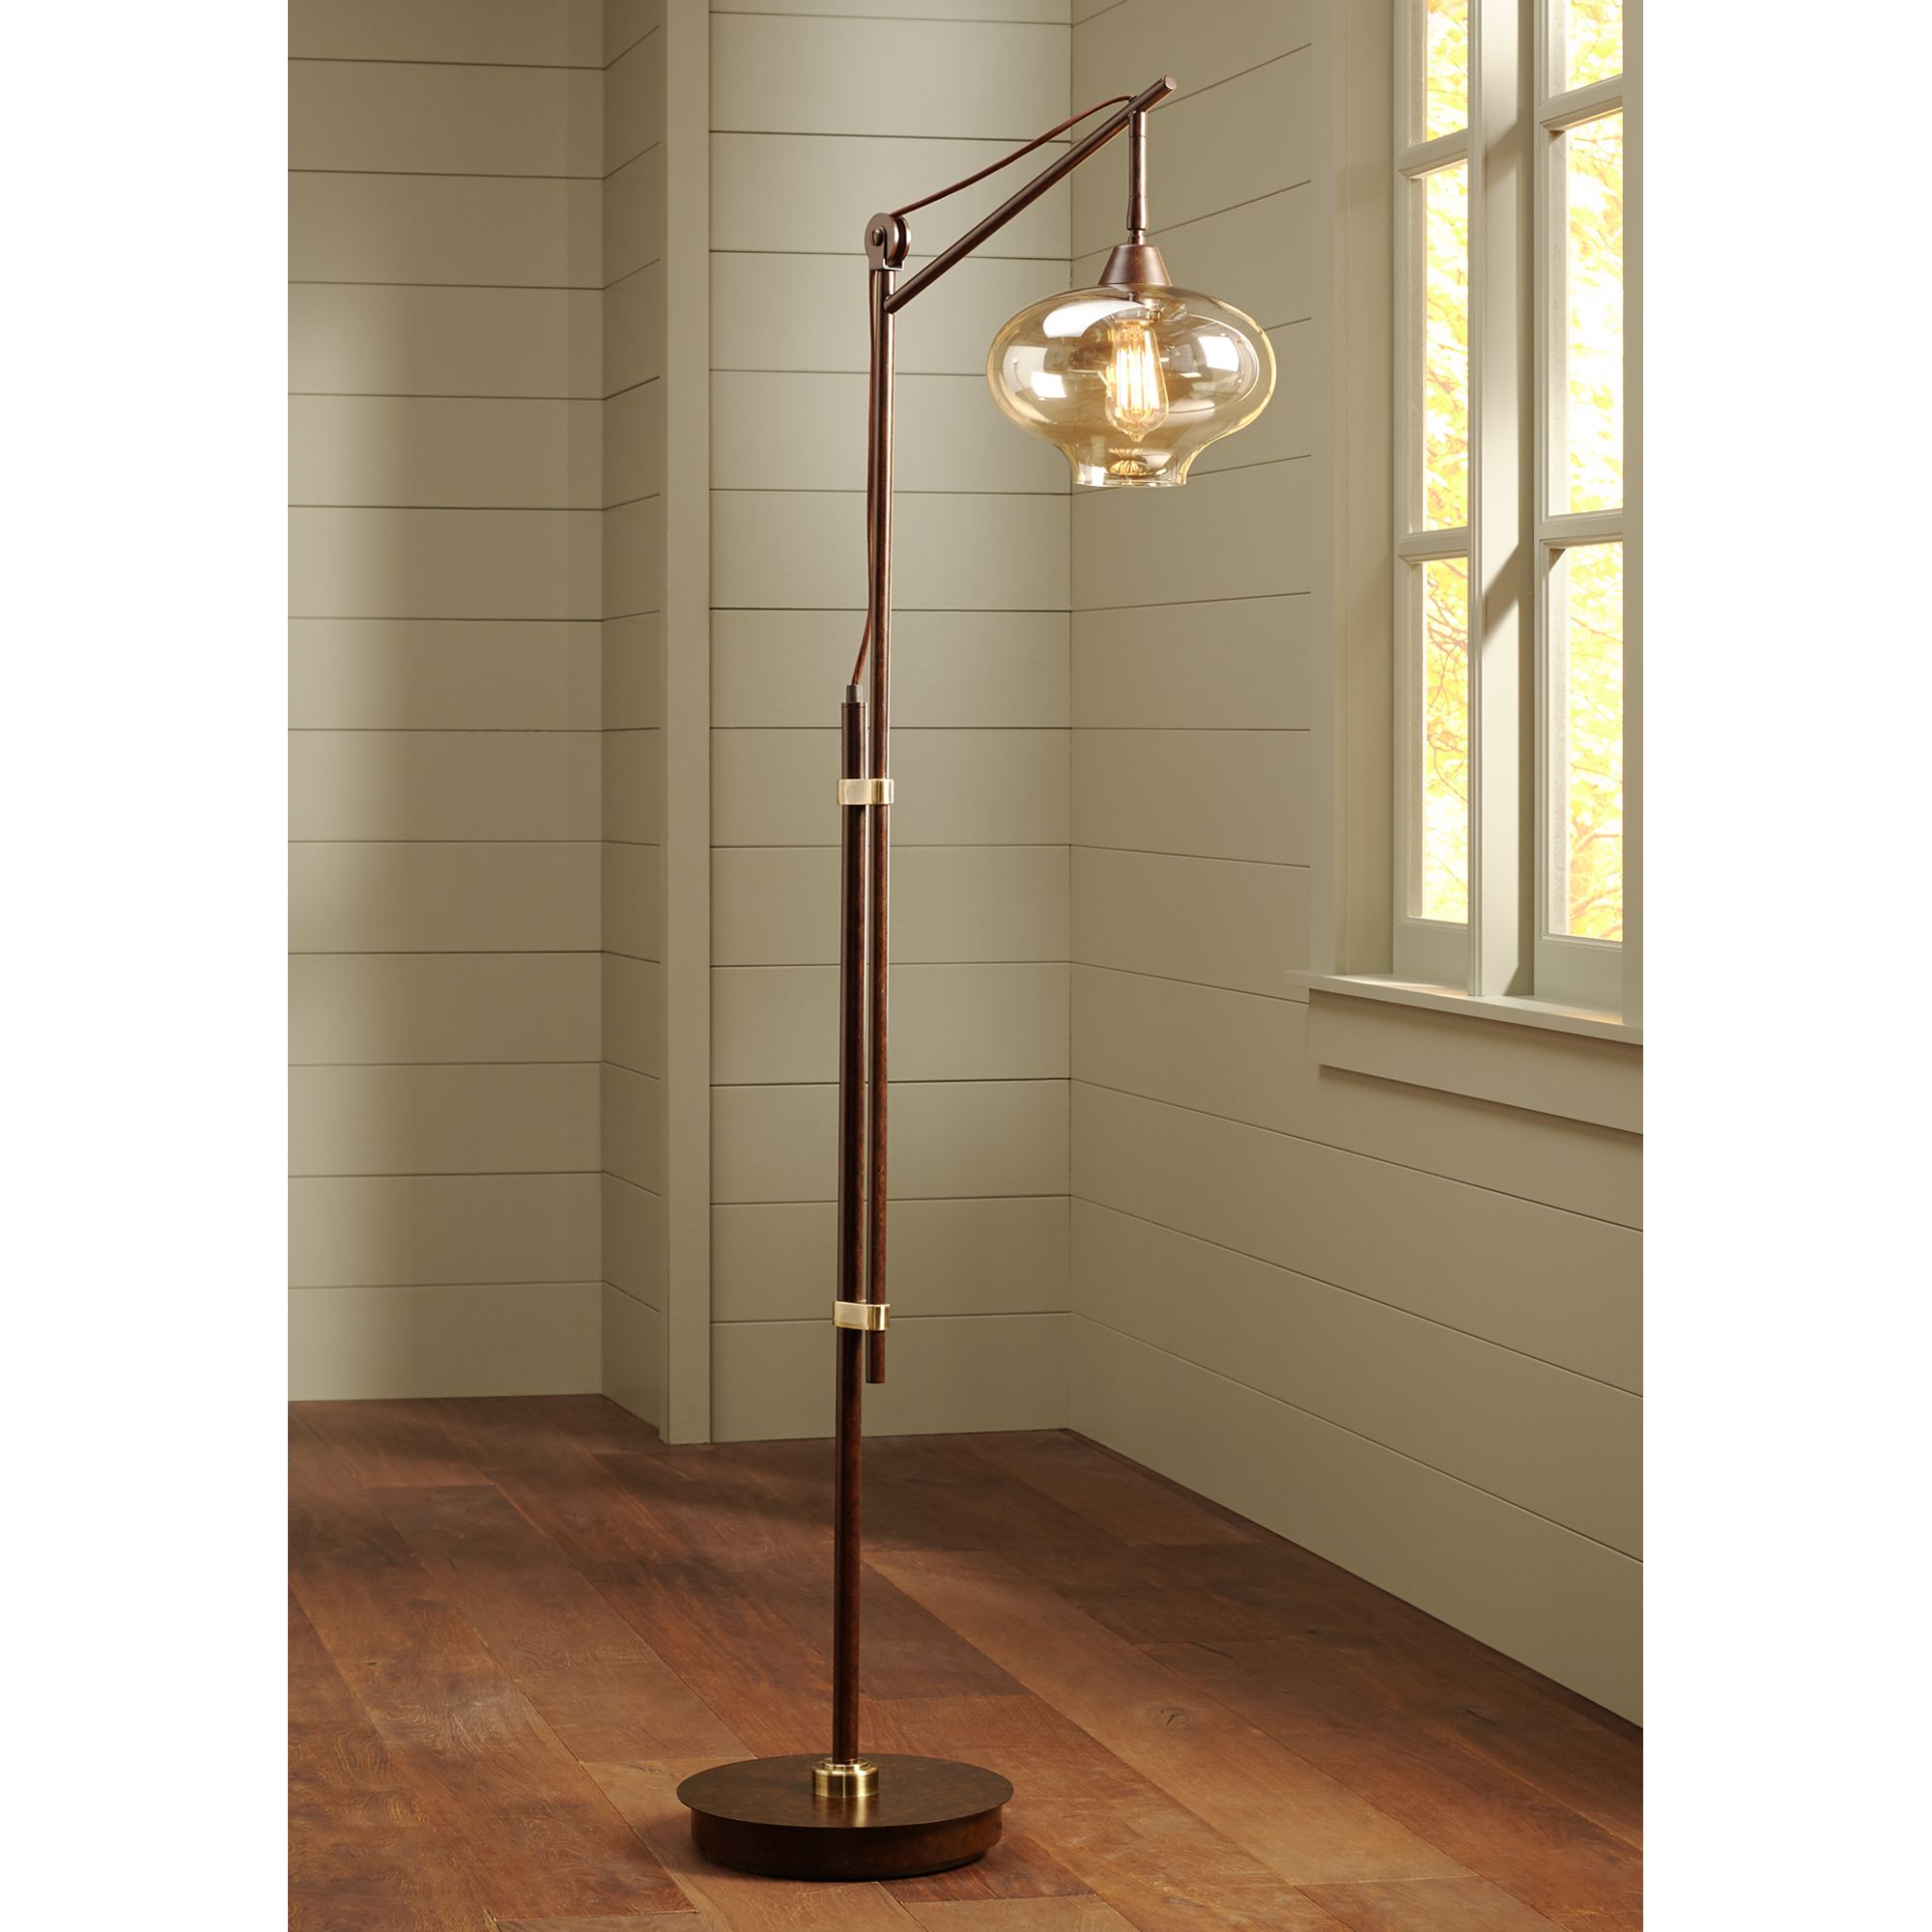 Franklin Iron Works Calyx Cognac Glass Industrial Bronze Floor Lamp by Franklin Iron Works